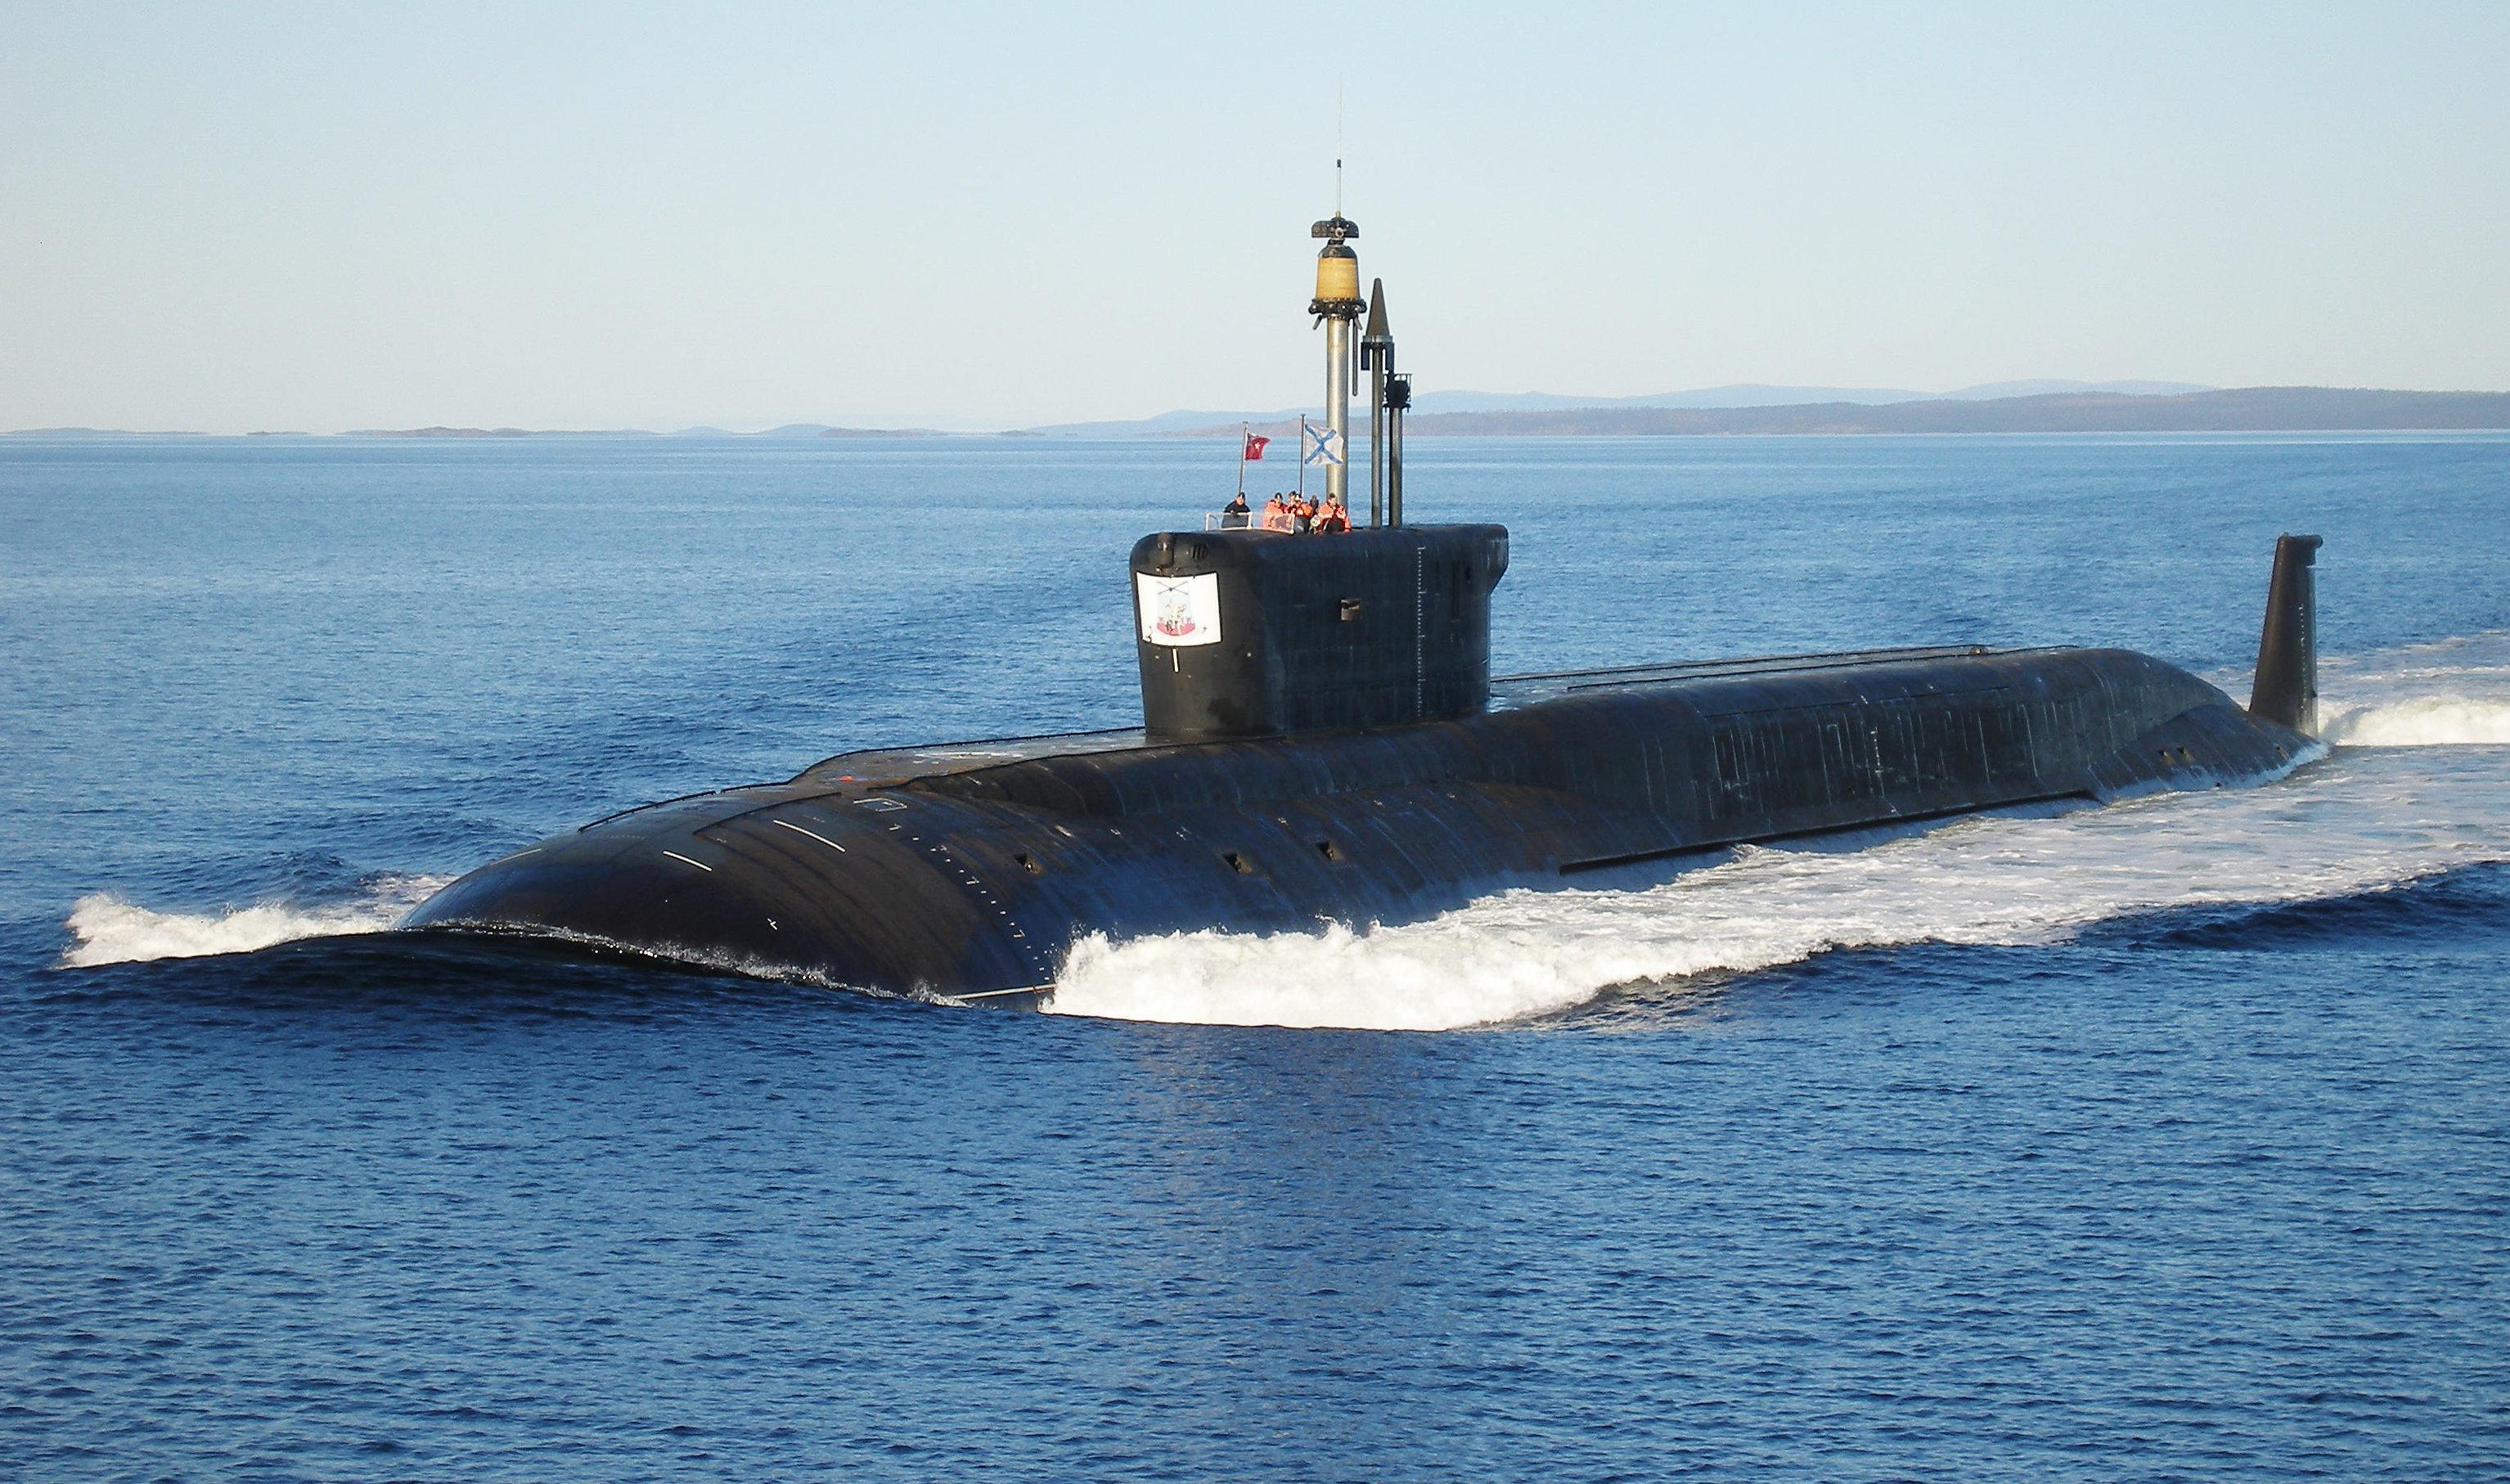 The Yuri Dolgorukiy undergoing sea trials